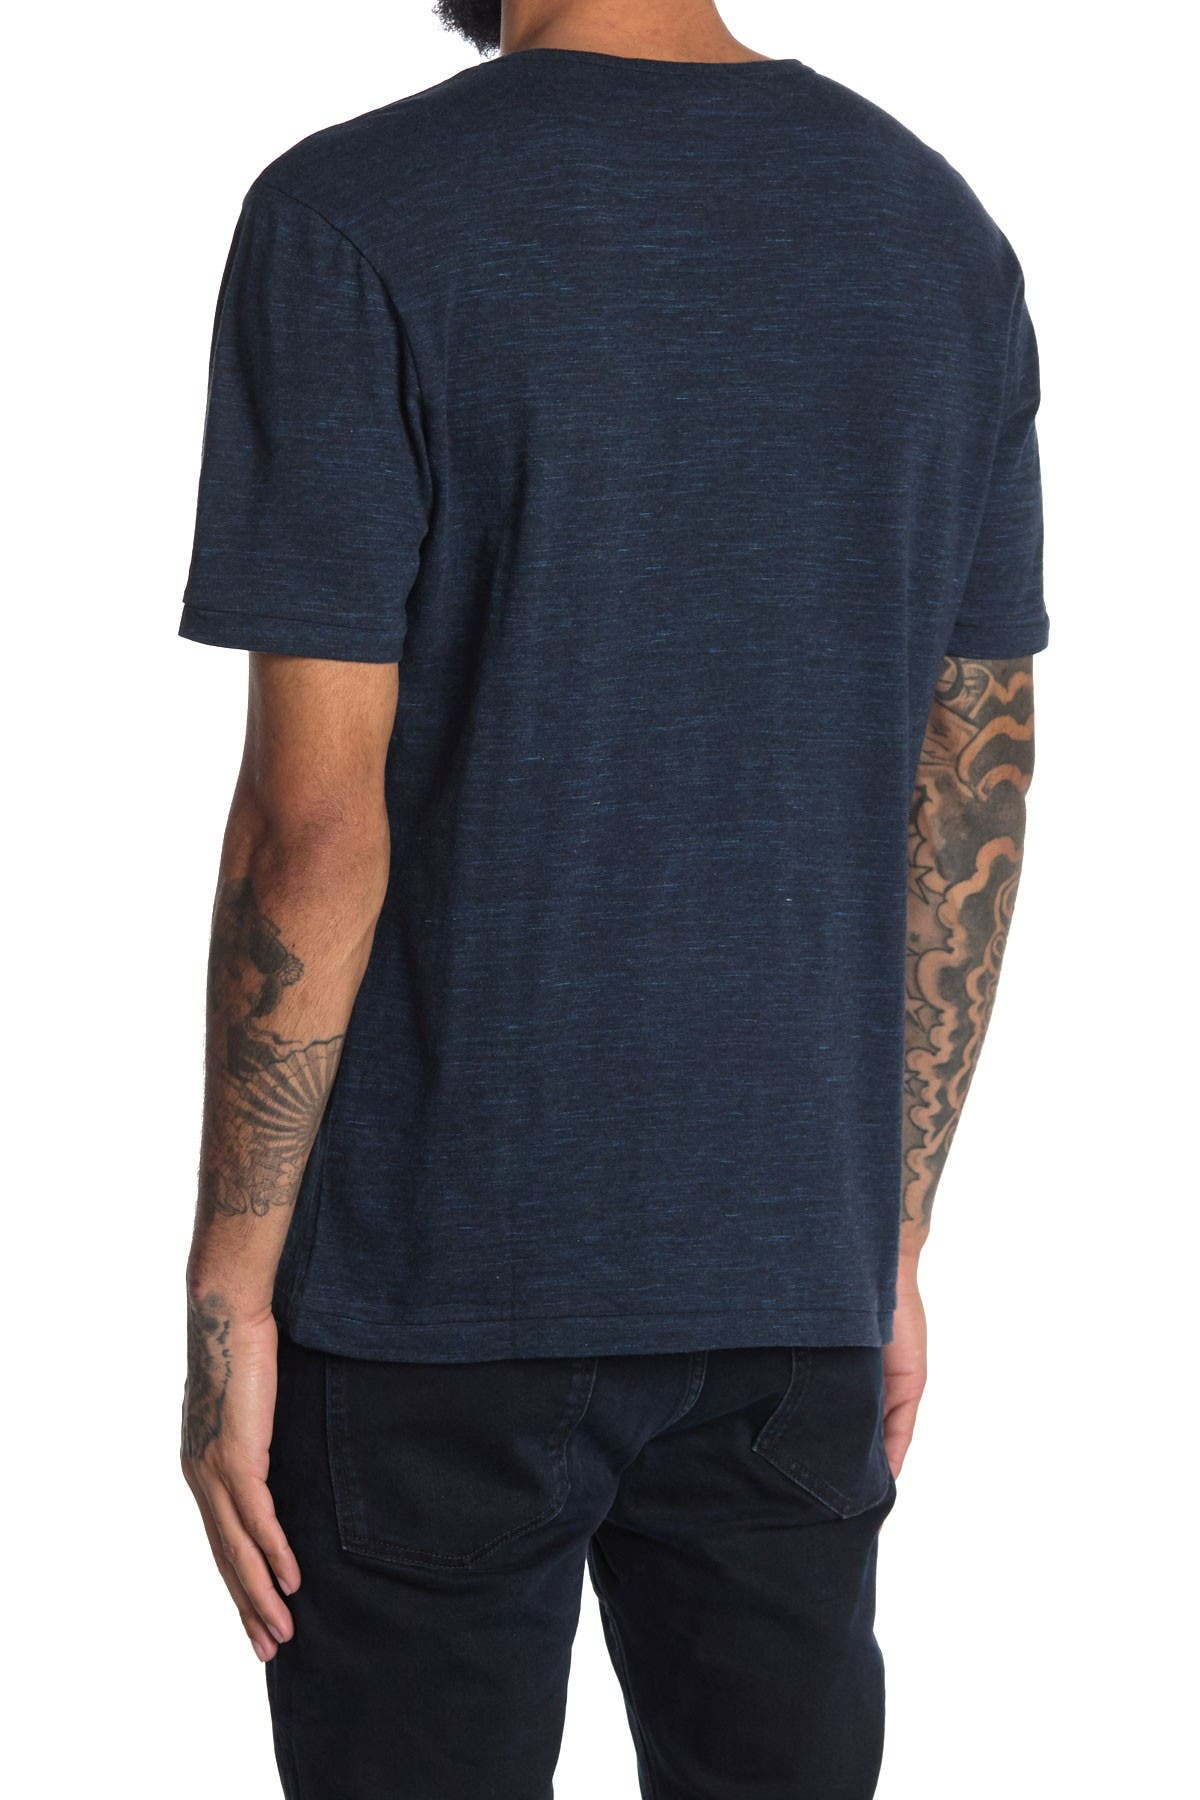 Image of Slate & Stone Crewneck T-Shirt